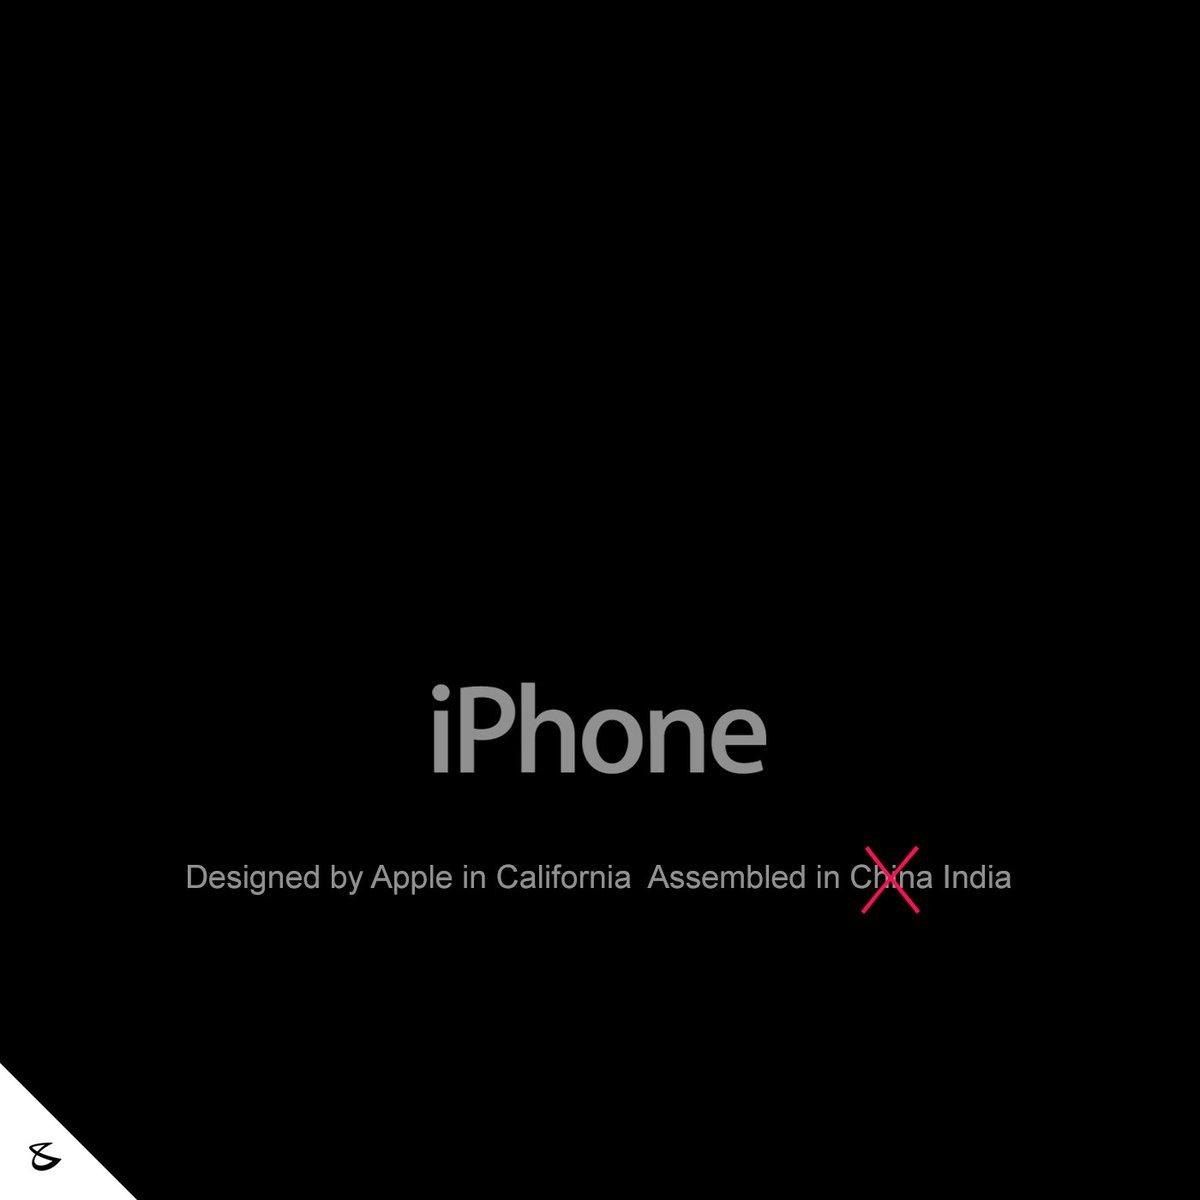 Bijoy Patel,  CantWait, AppleIndia, OneStepCloser, Apple, iPhone7s, MakeInIndia